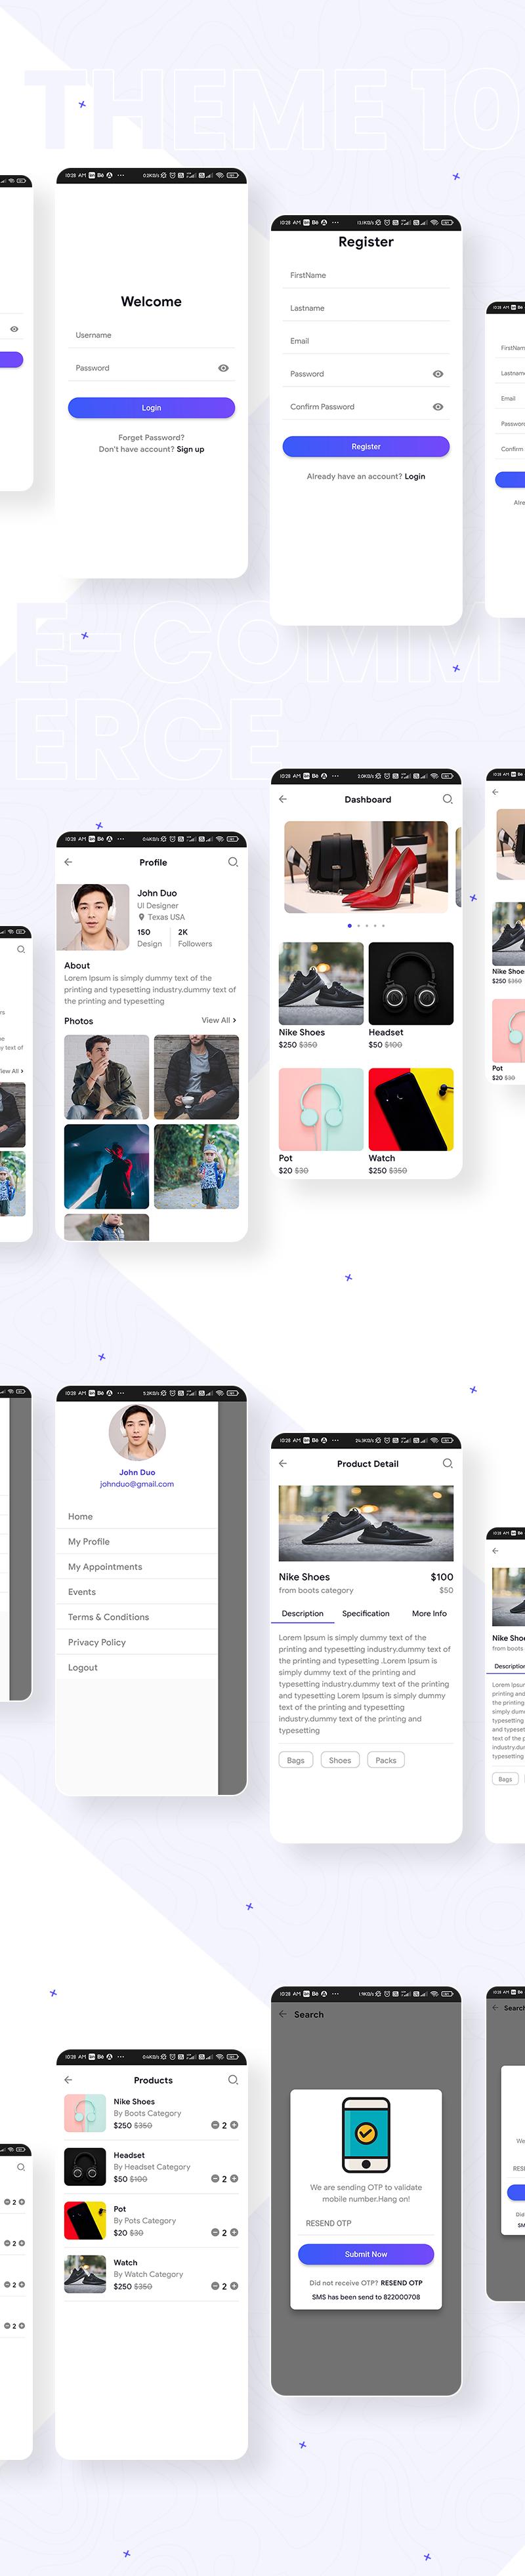 Biggest Flutter 2.0 UI Kit | Prokit | Iqonic Design biggest flutter 2.0 ui kit ProKit theme 10